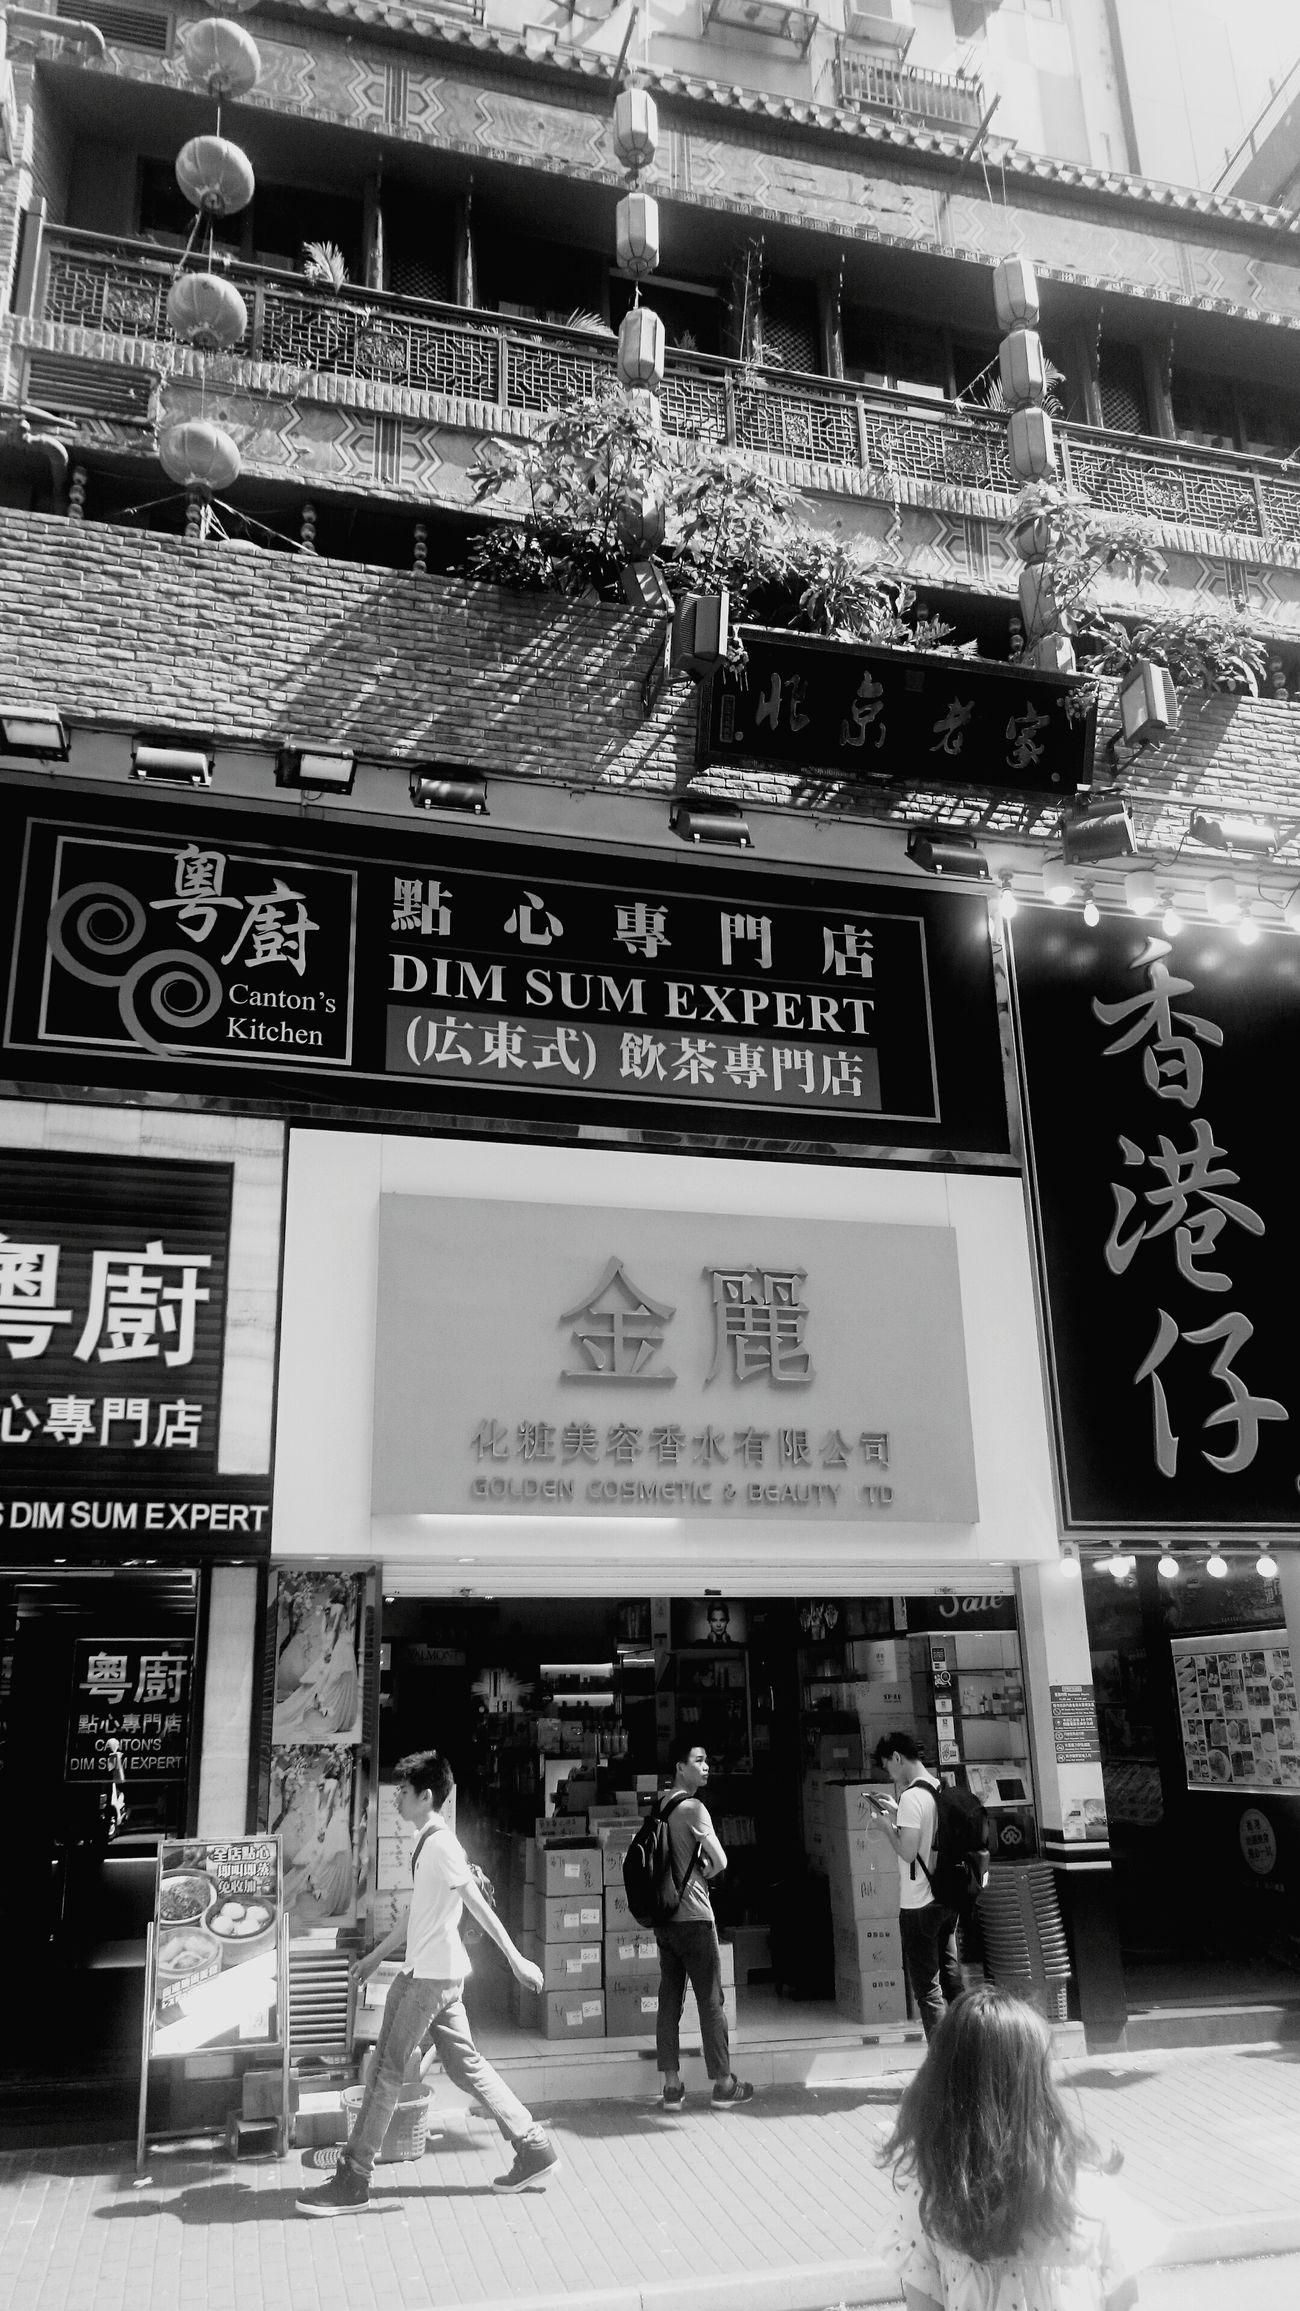 HongKong Hongkongphotography Hongkonglife Hongkongcollection Hong Kong City Hongkongcity Hongkongstreet Fortheloveofblackandwhite B&w Street Photography Black And White Hongkong Black&white Blackandwhite Blackandwhite Photography The Street Photographer - 2017 EyeEm Awards Street Photography City Street